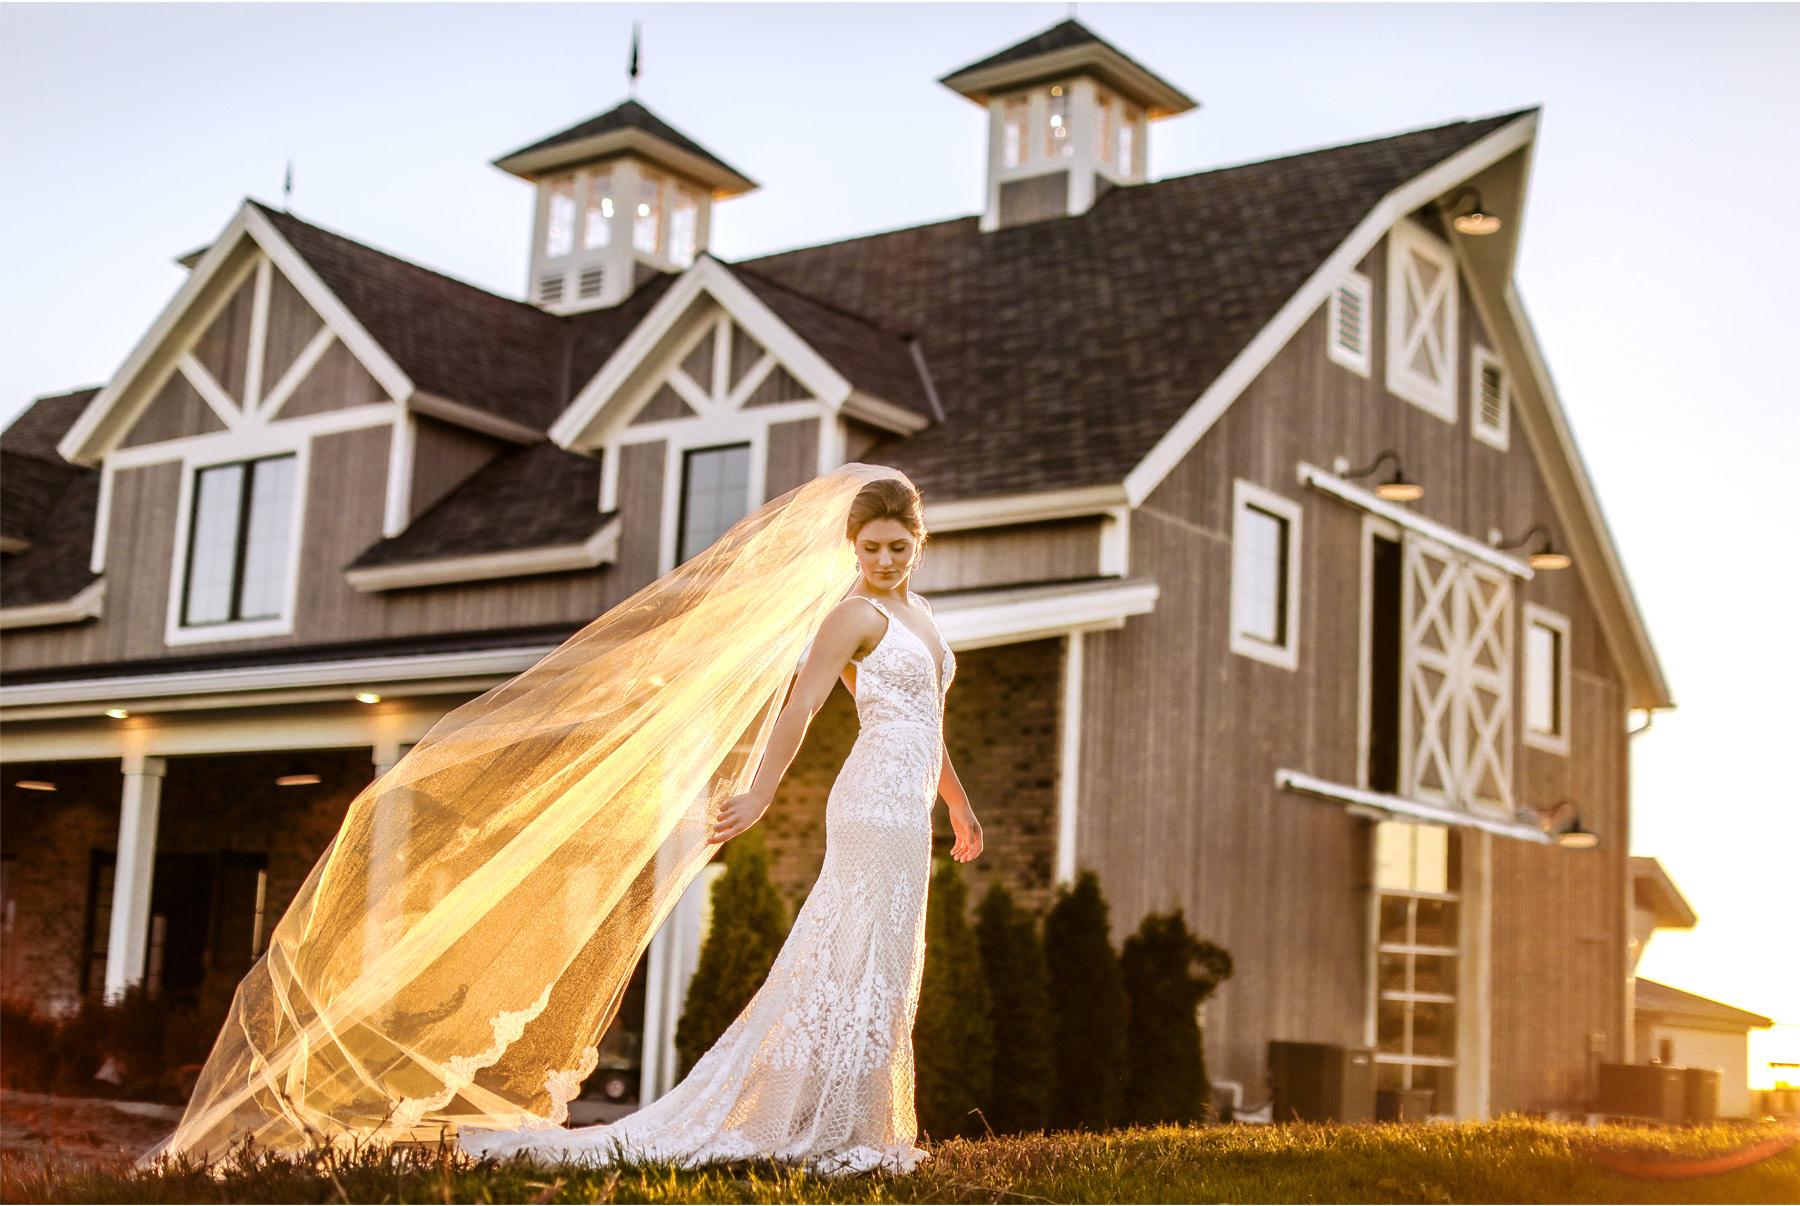 16-Ashery-Lane-Farm-Minneapolis-Minnesota-Wedding-Styled-Shoot-New-Venue-Barn-Orchard-Vineyard-Sunset.jpg